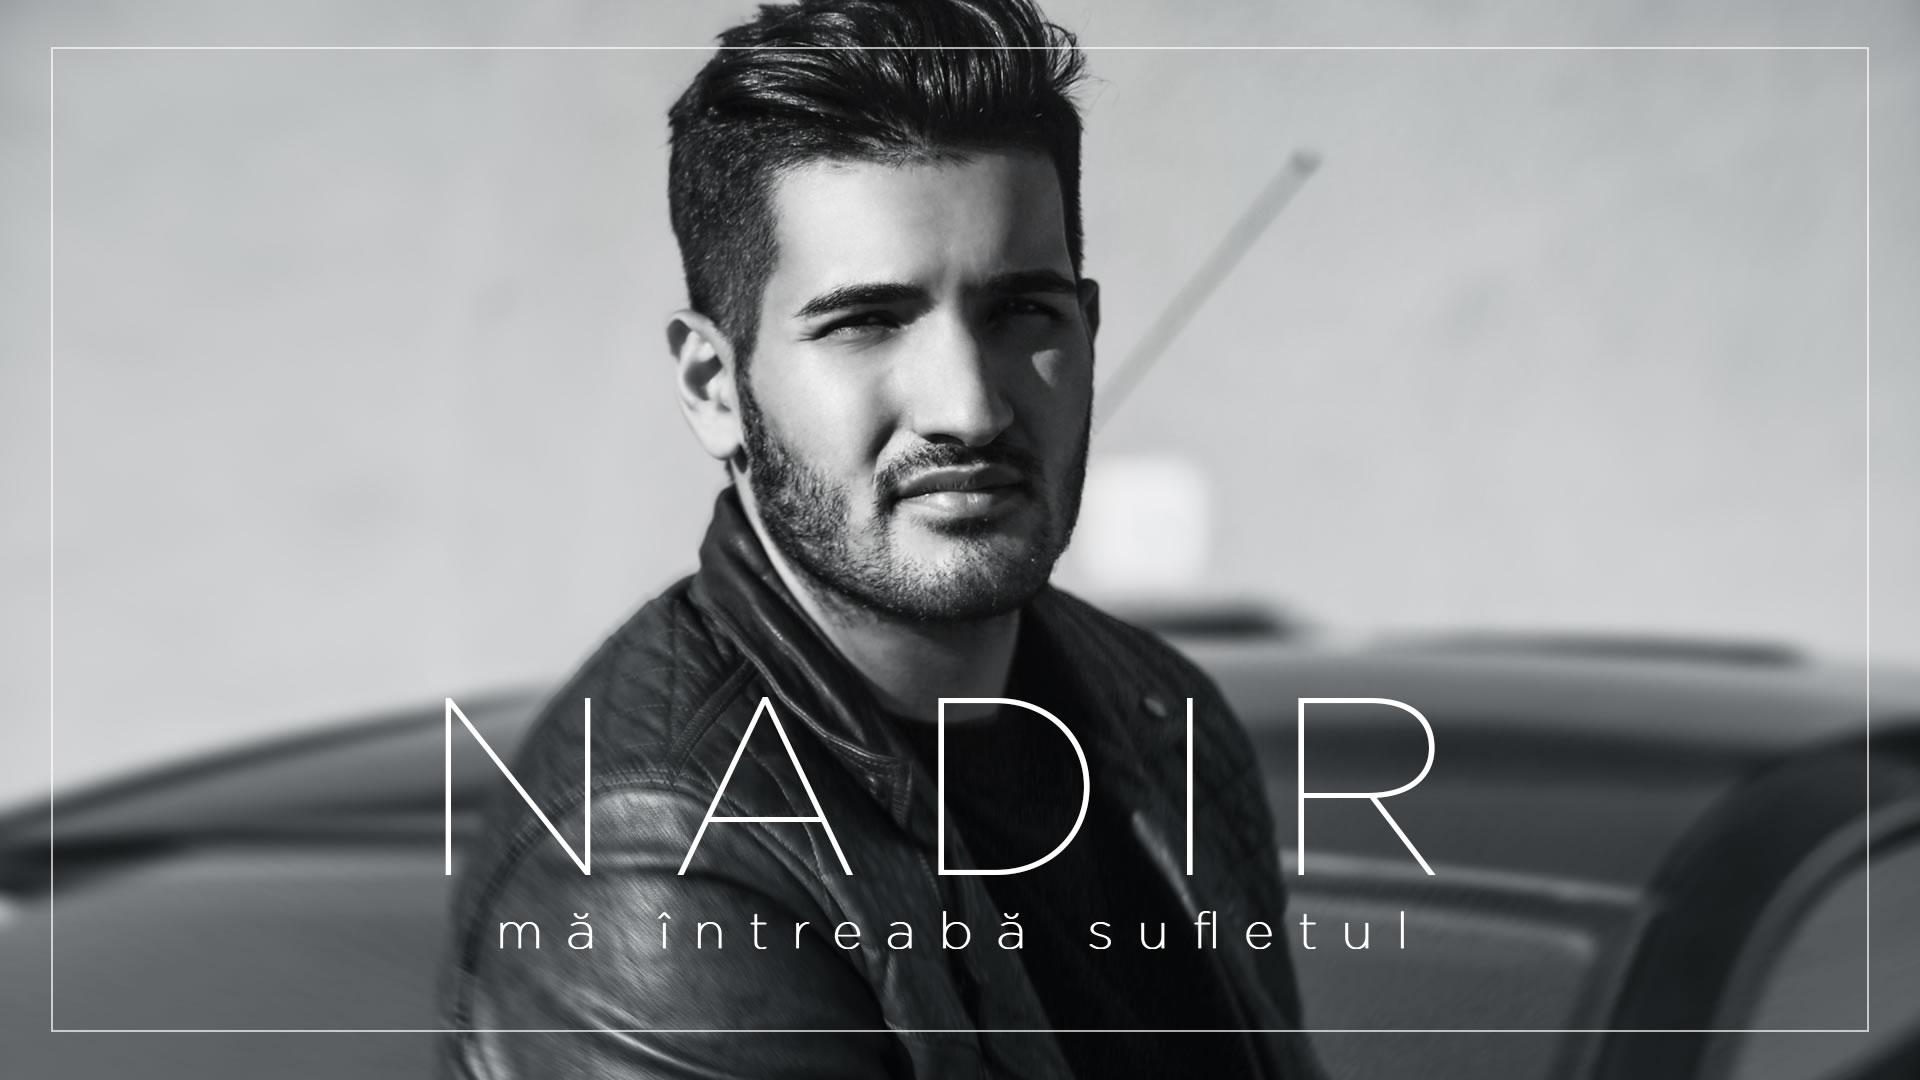 Nadir - Ma intreaba sufletul